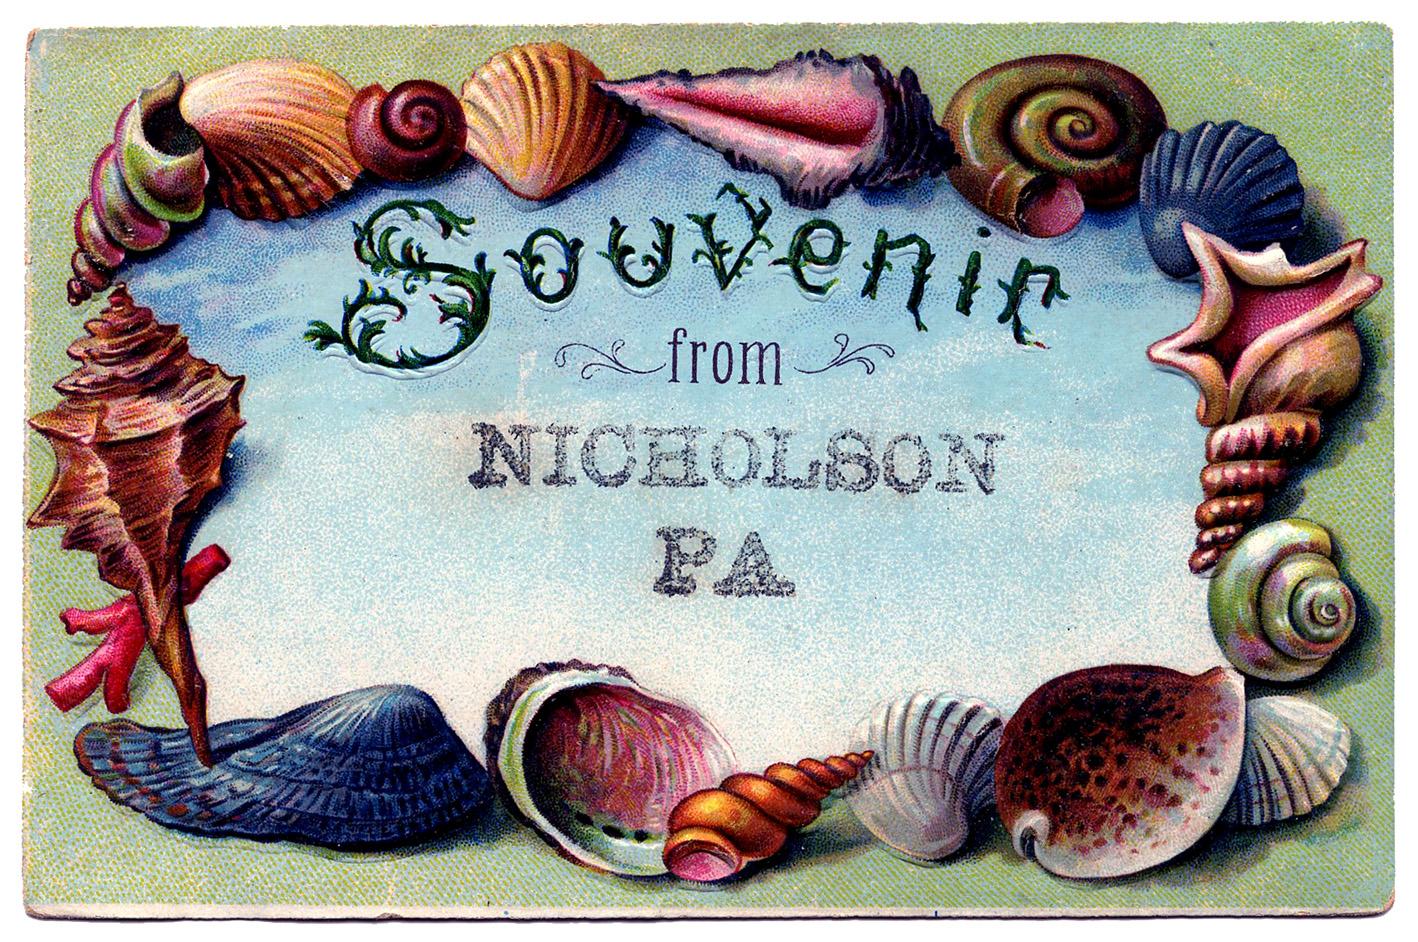 Vintage Clip Art Souvenir Seashell Postcard 2 The